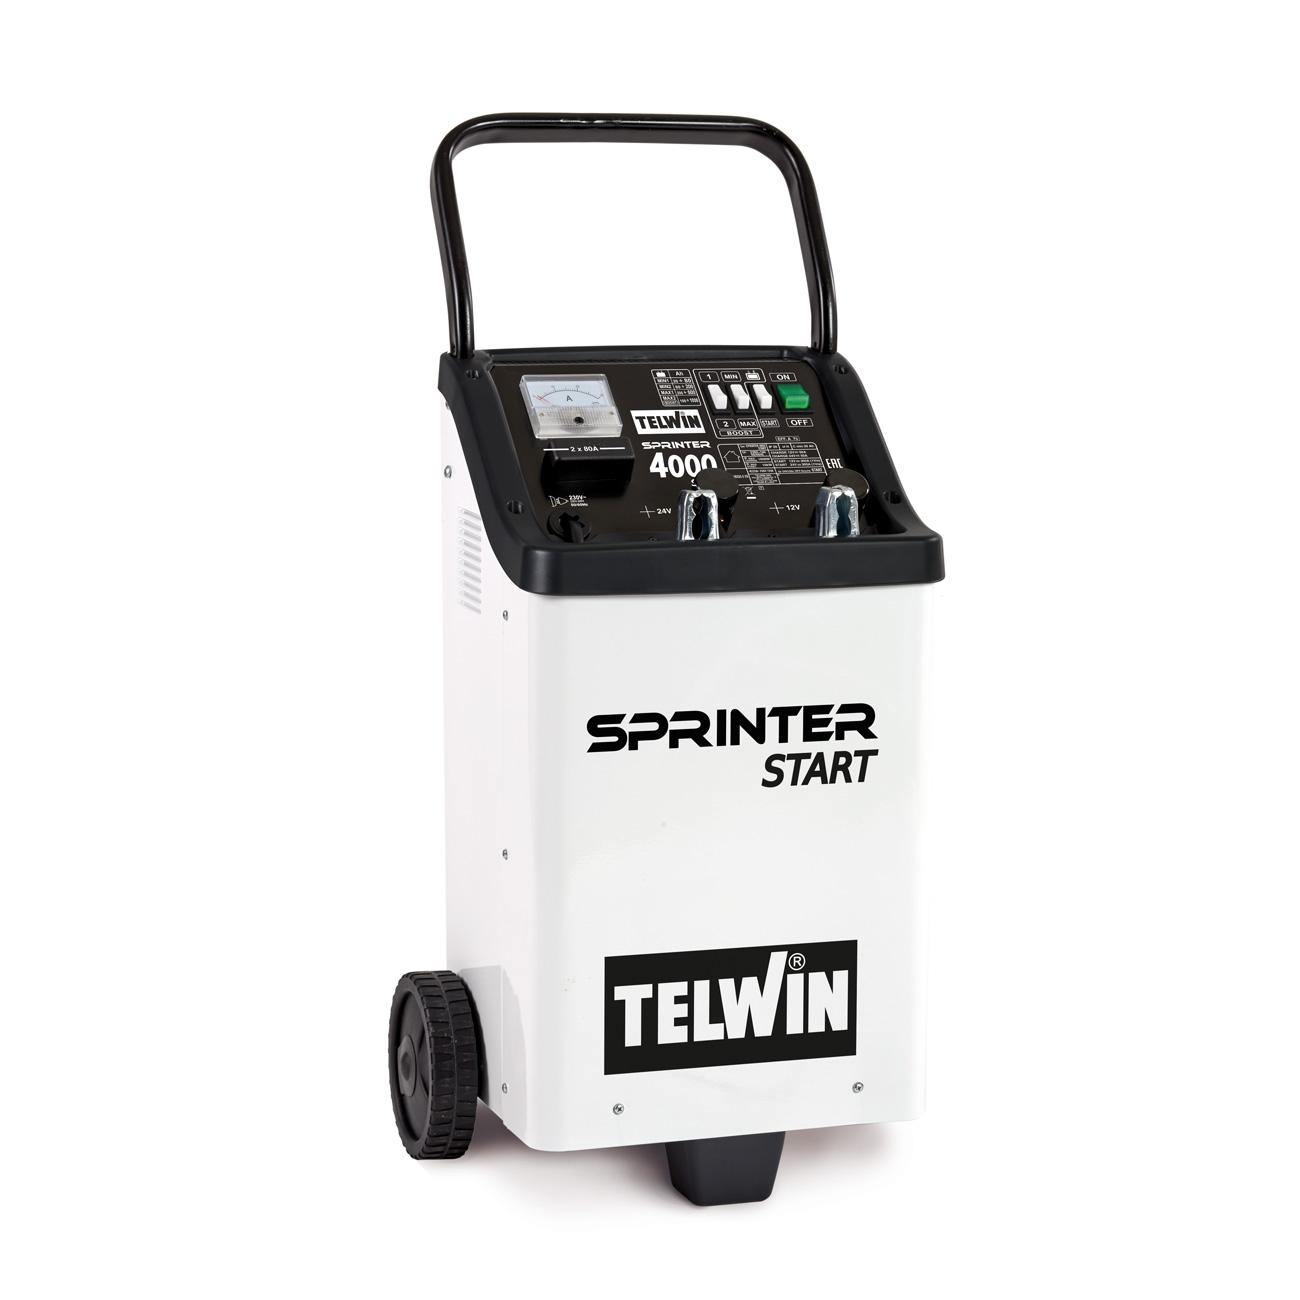 Image of Caricabatterie e avviatore Telwin Sprinter 4000 Start